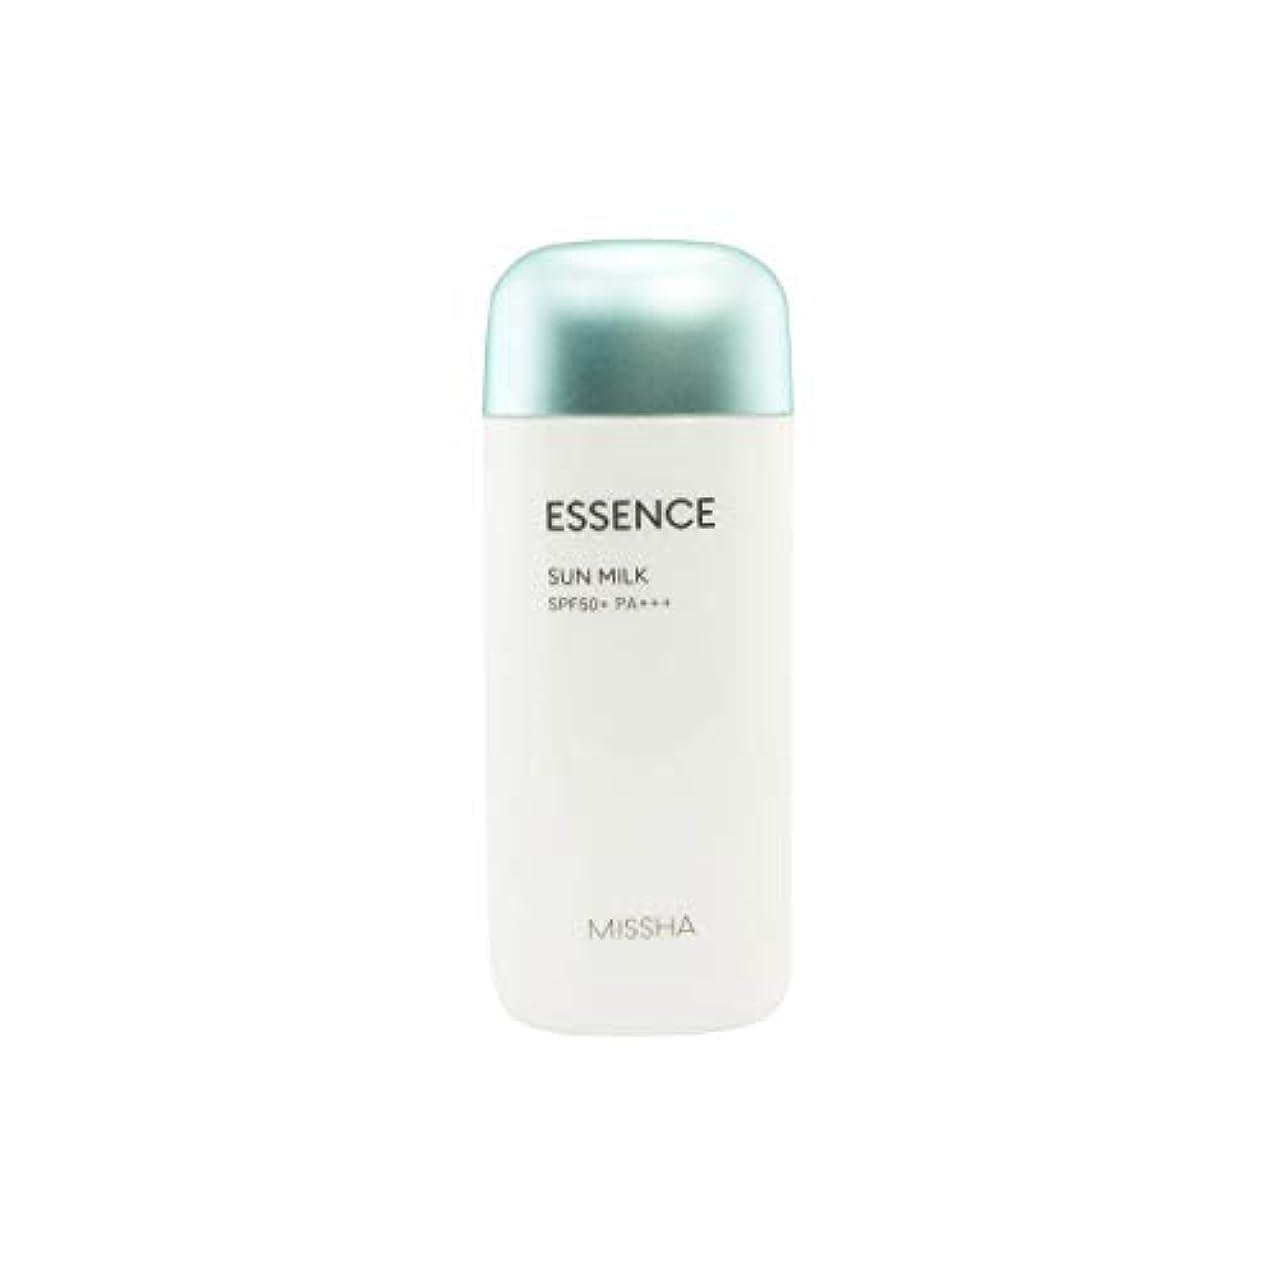 知覚前置詞主張するMissha All-around Safe Block Essence Sun Milk Spf50+/pa+++ 70ml [並行輸入品]